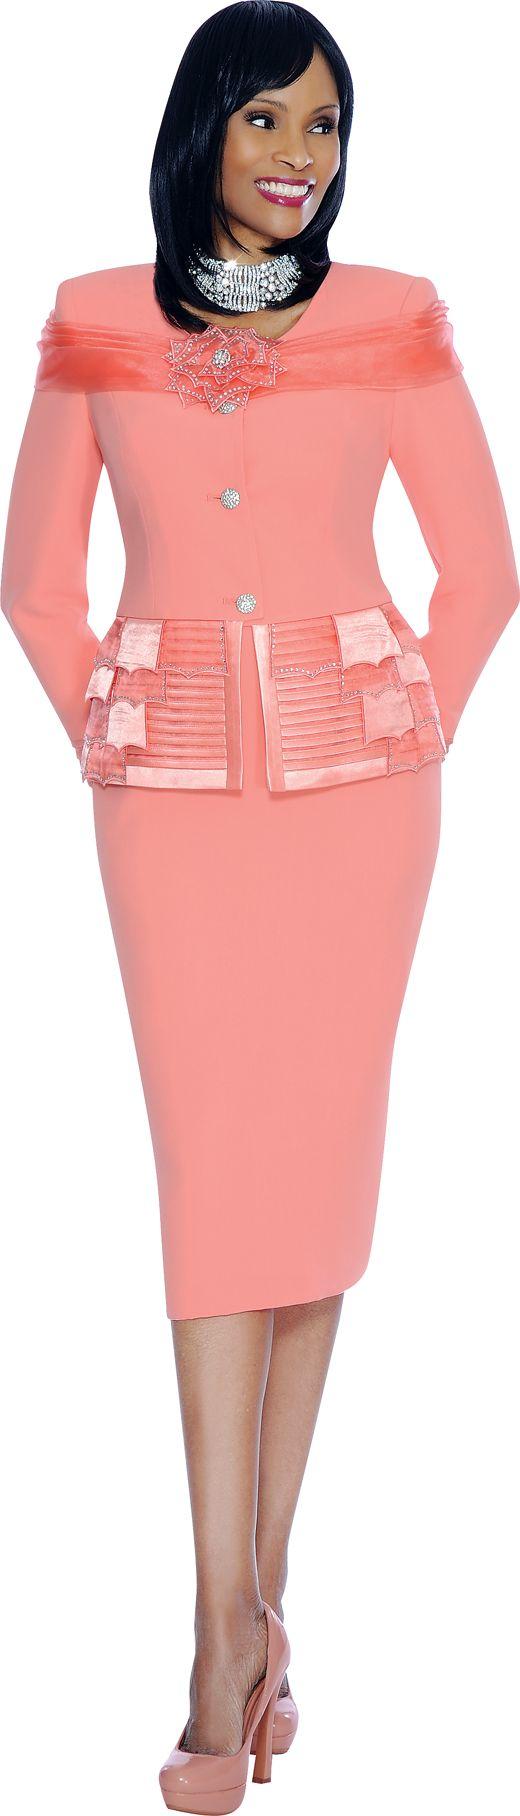 Dress Suits For Women Church | church suits | Pinterest | Kostymer ...